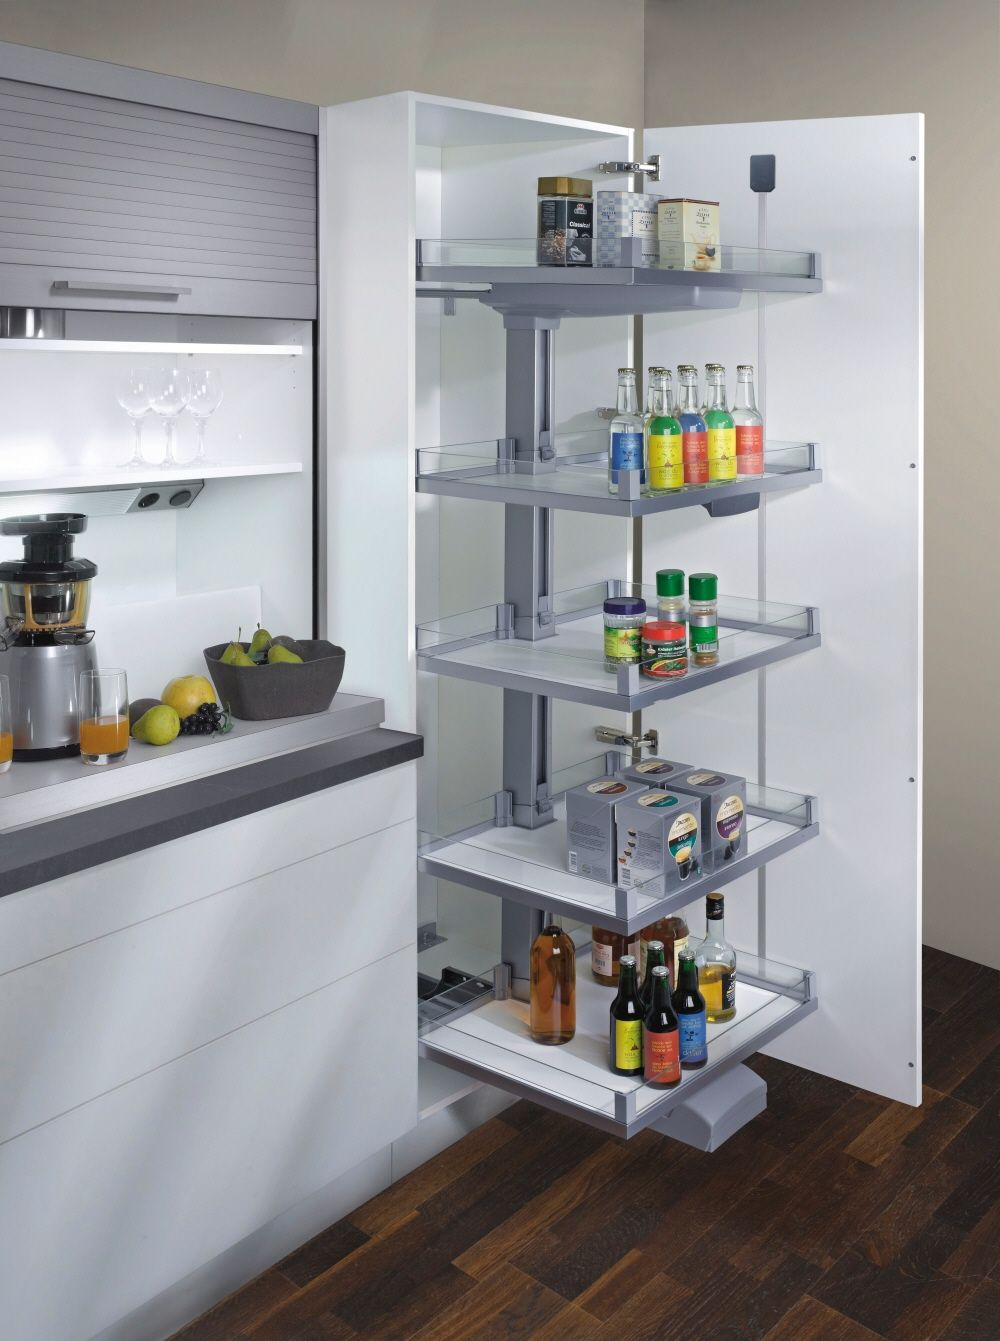 Eckschrank küche auszug  Eckschrank Küche Auszug – wotzc moebel | HWR | Pinterest ...